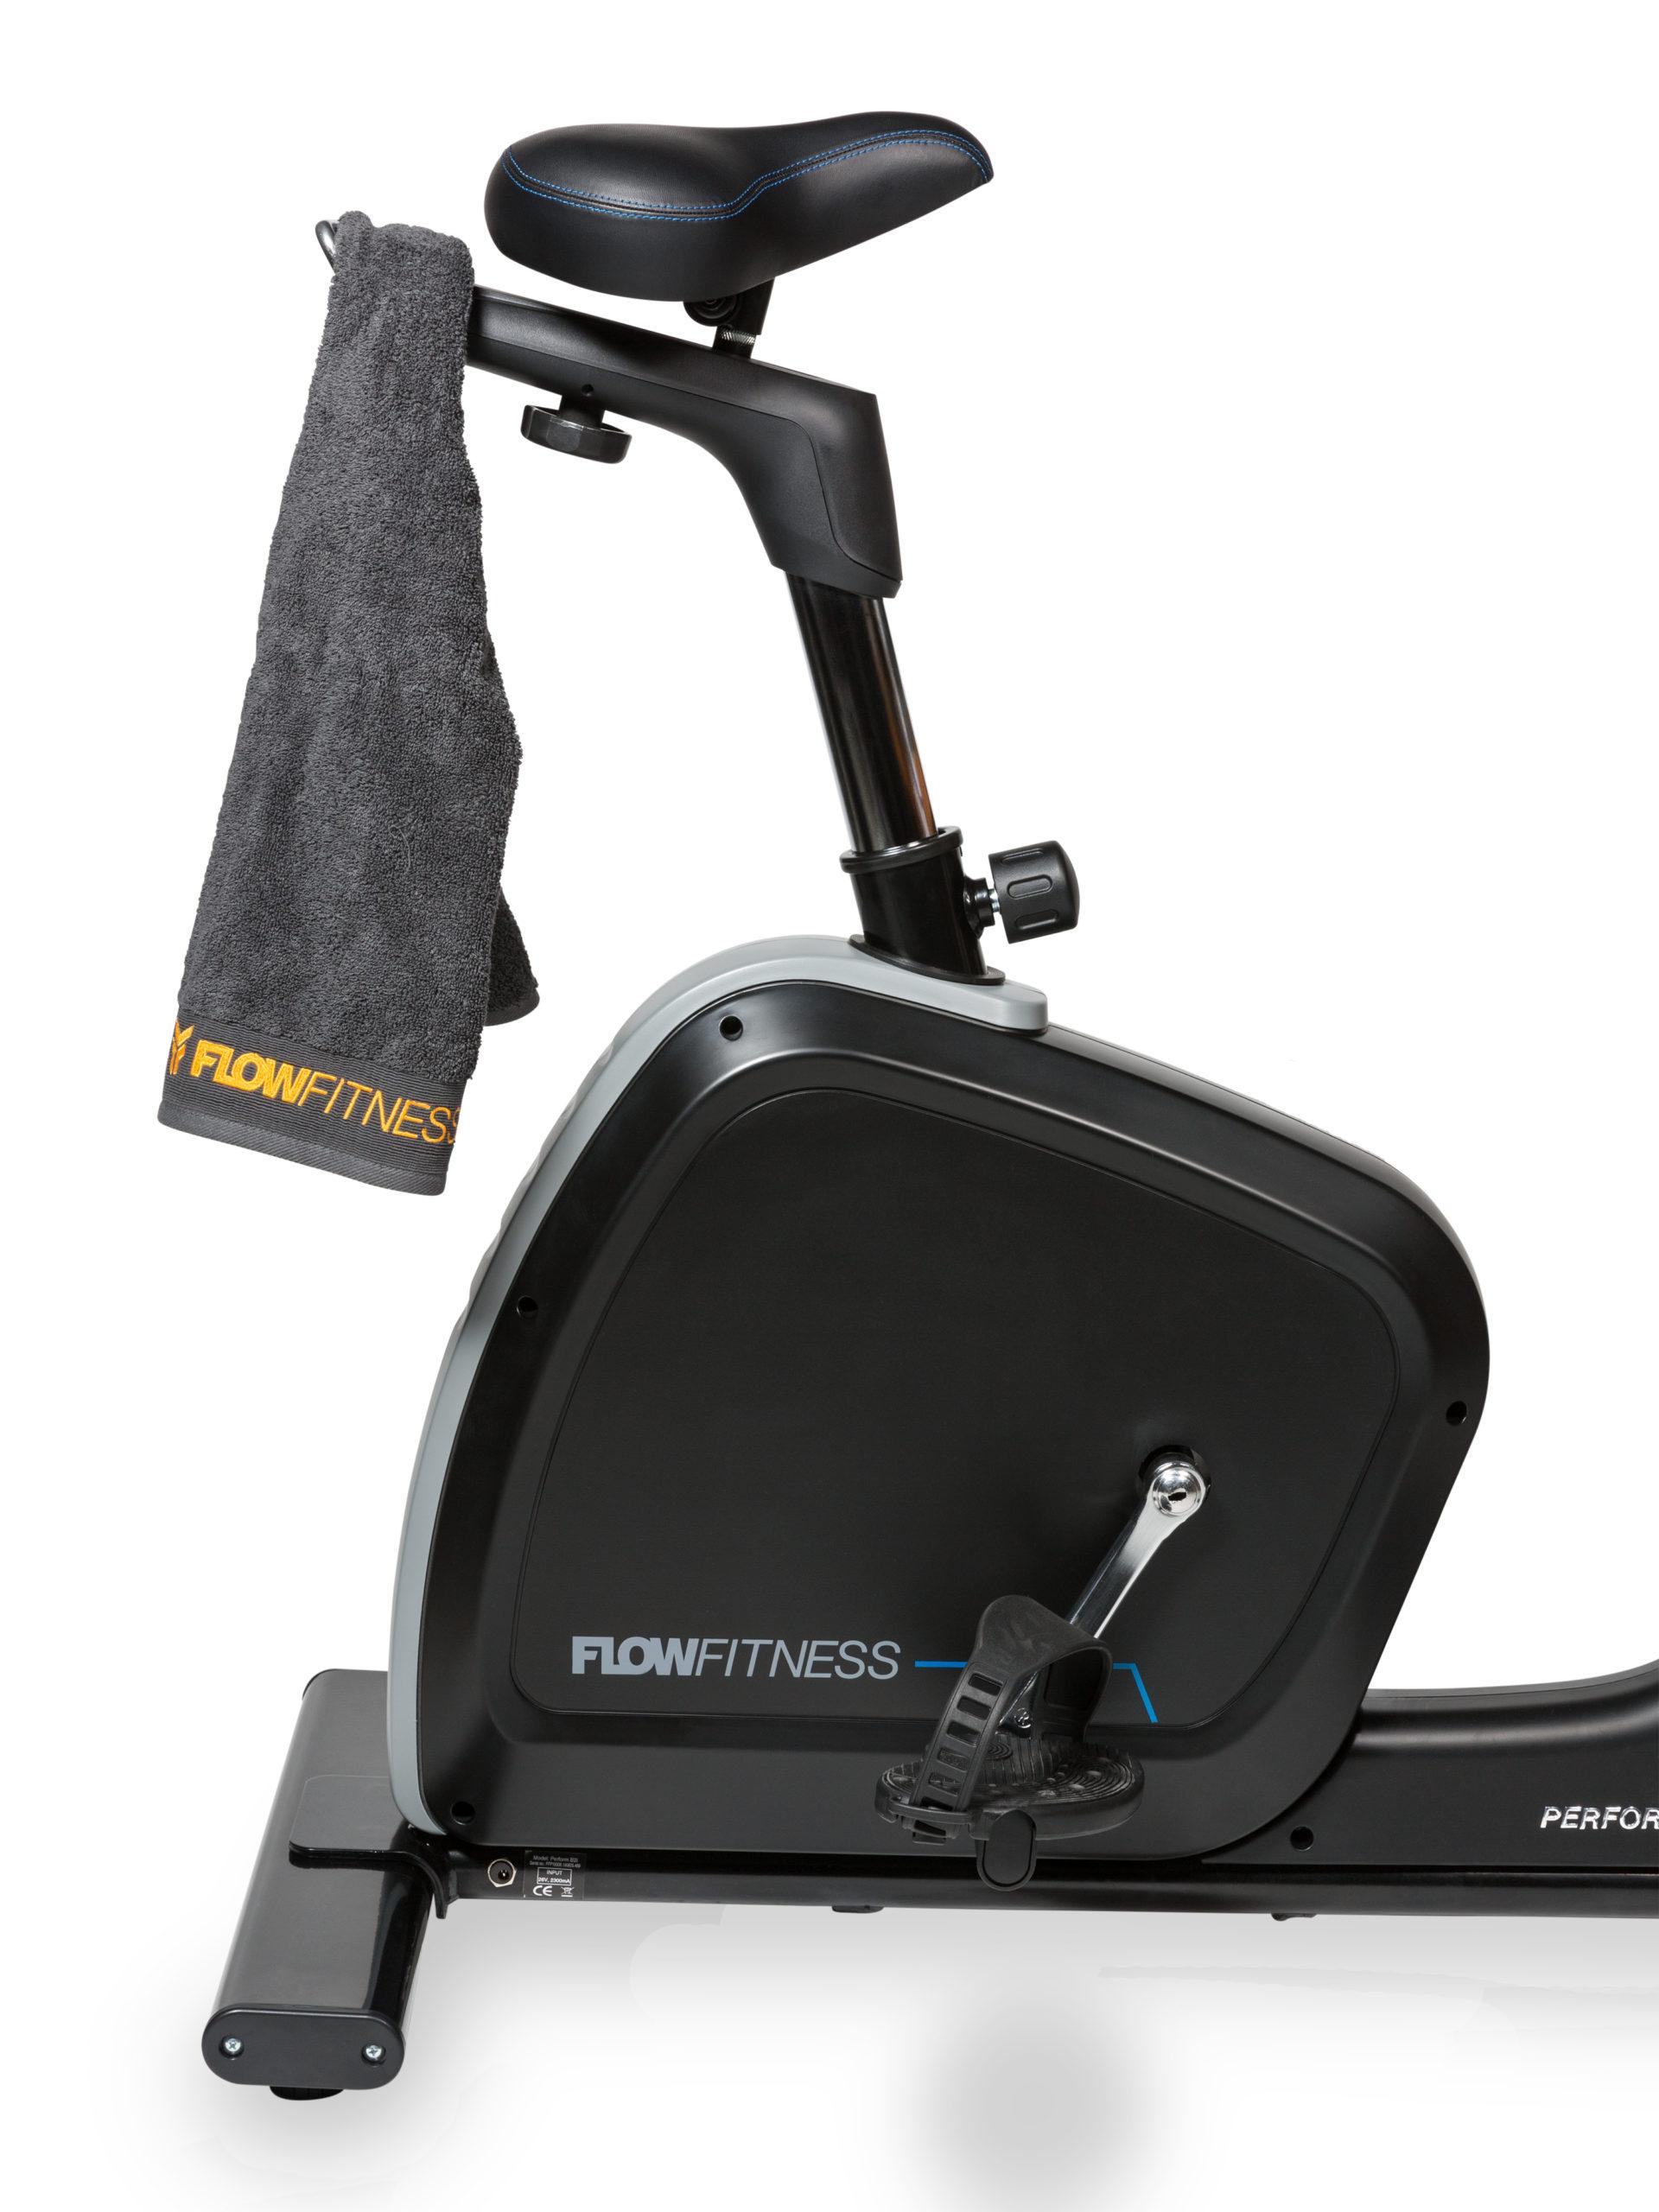 Flow Fitness Tabel PERFORM B2i Ergometer